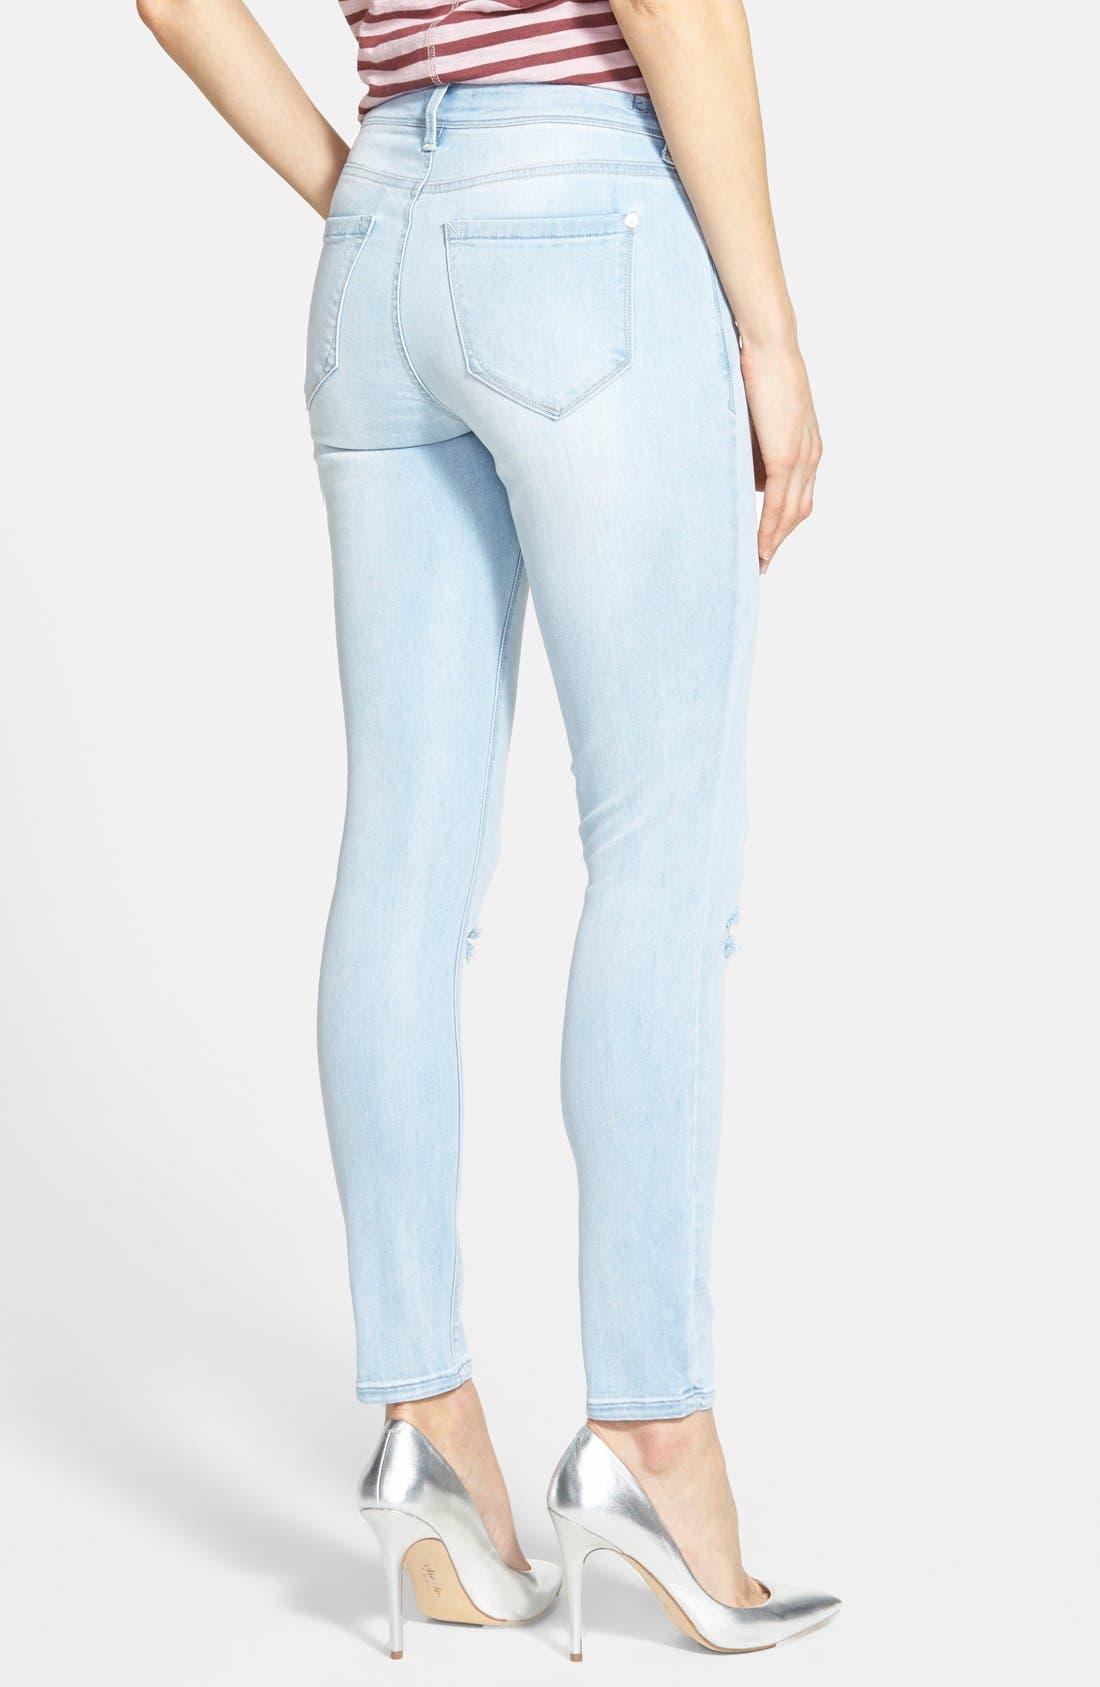 Alternate Image 2  - kensie 'Ankle Biter' Destroyed Skinny Jeans (Like a Rolling Stone)